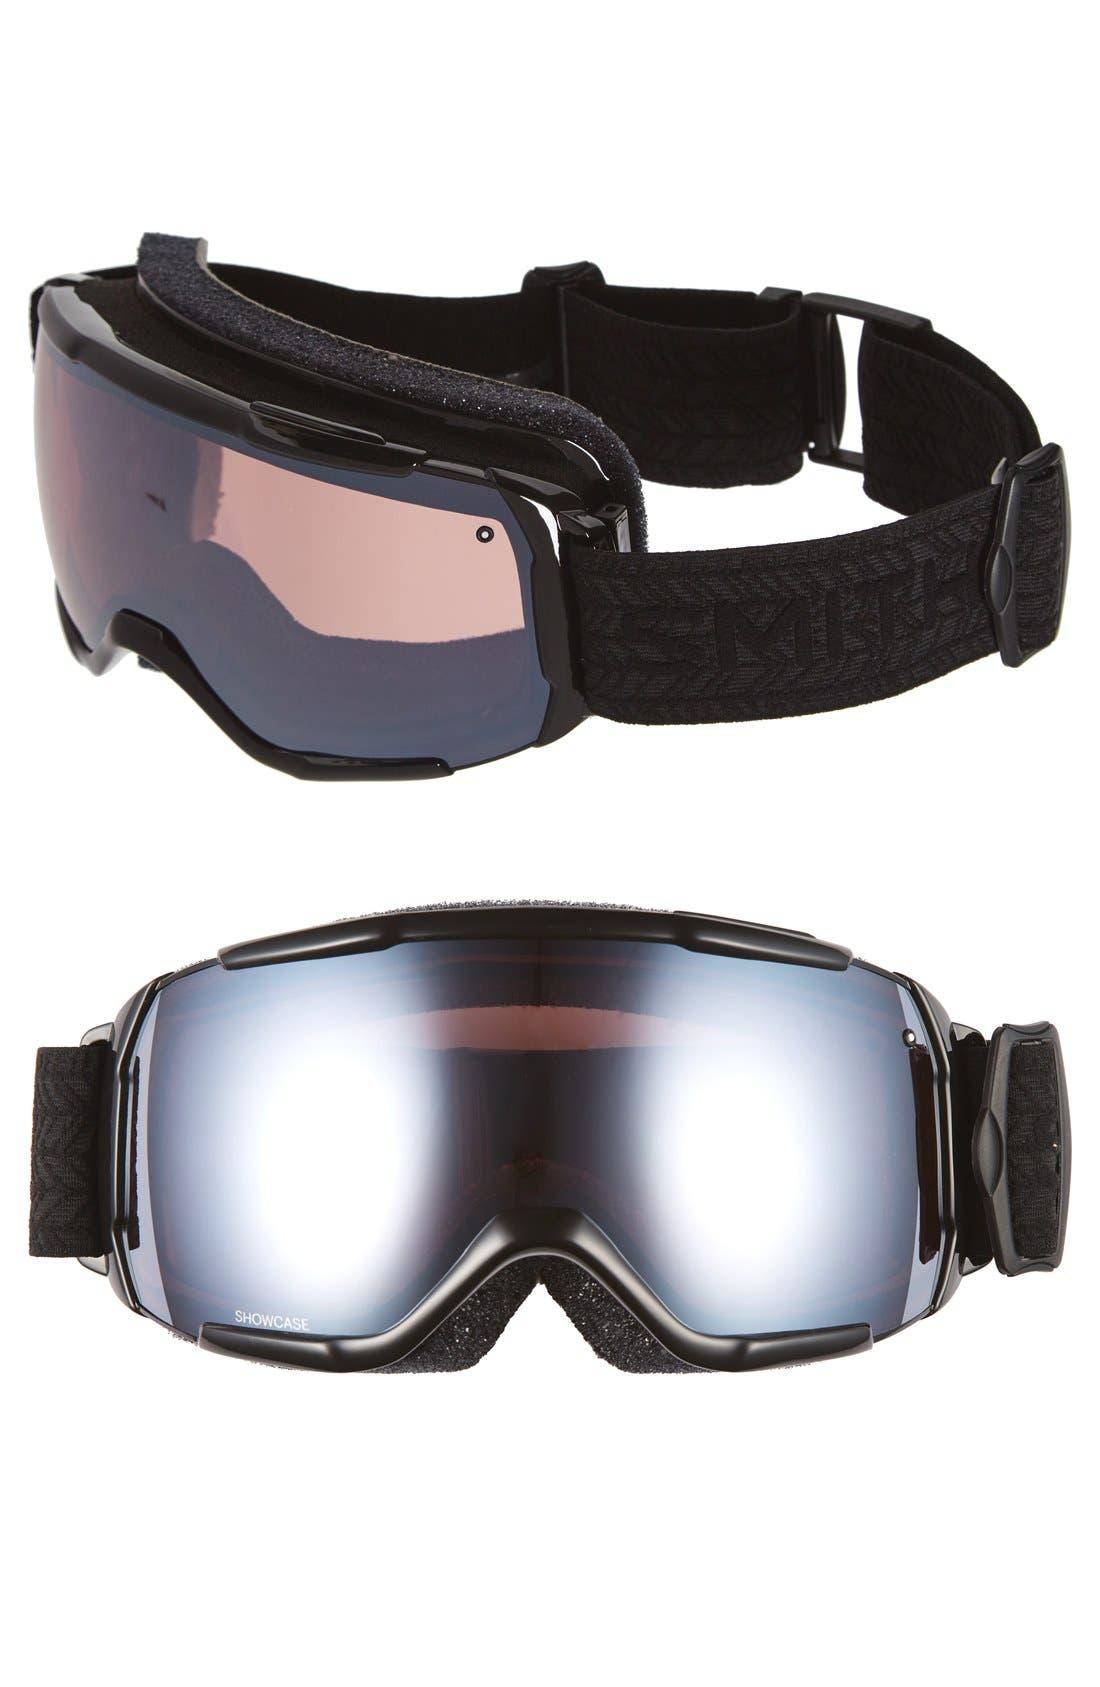 Smith 'Showcase OTG' Snow Goggles